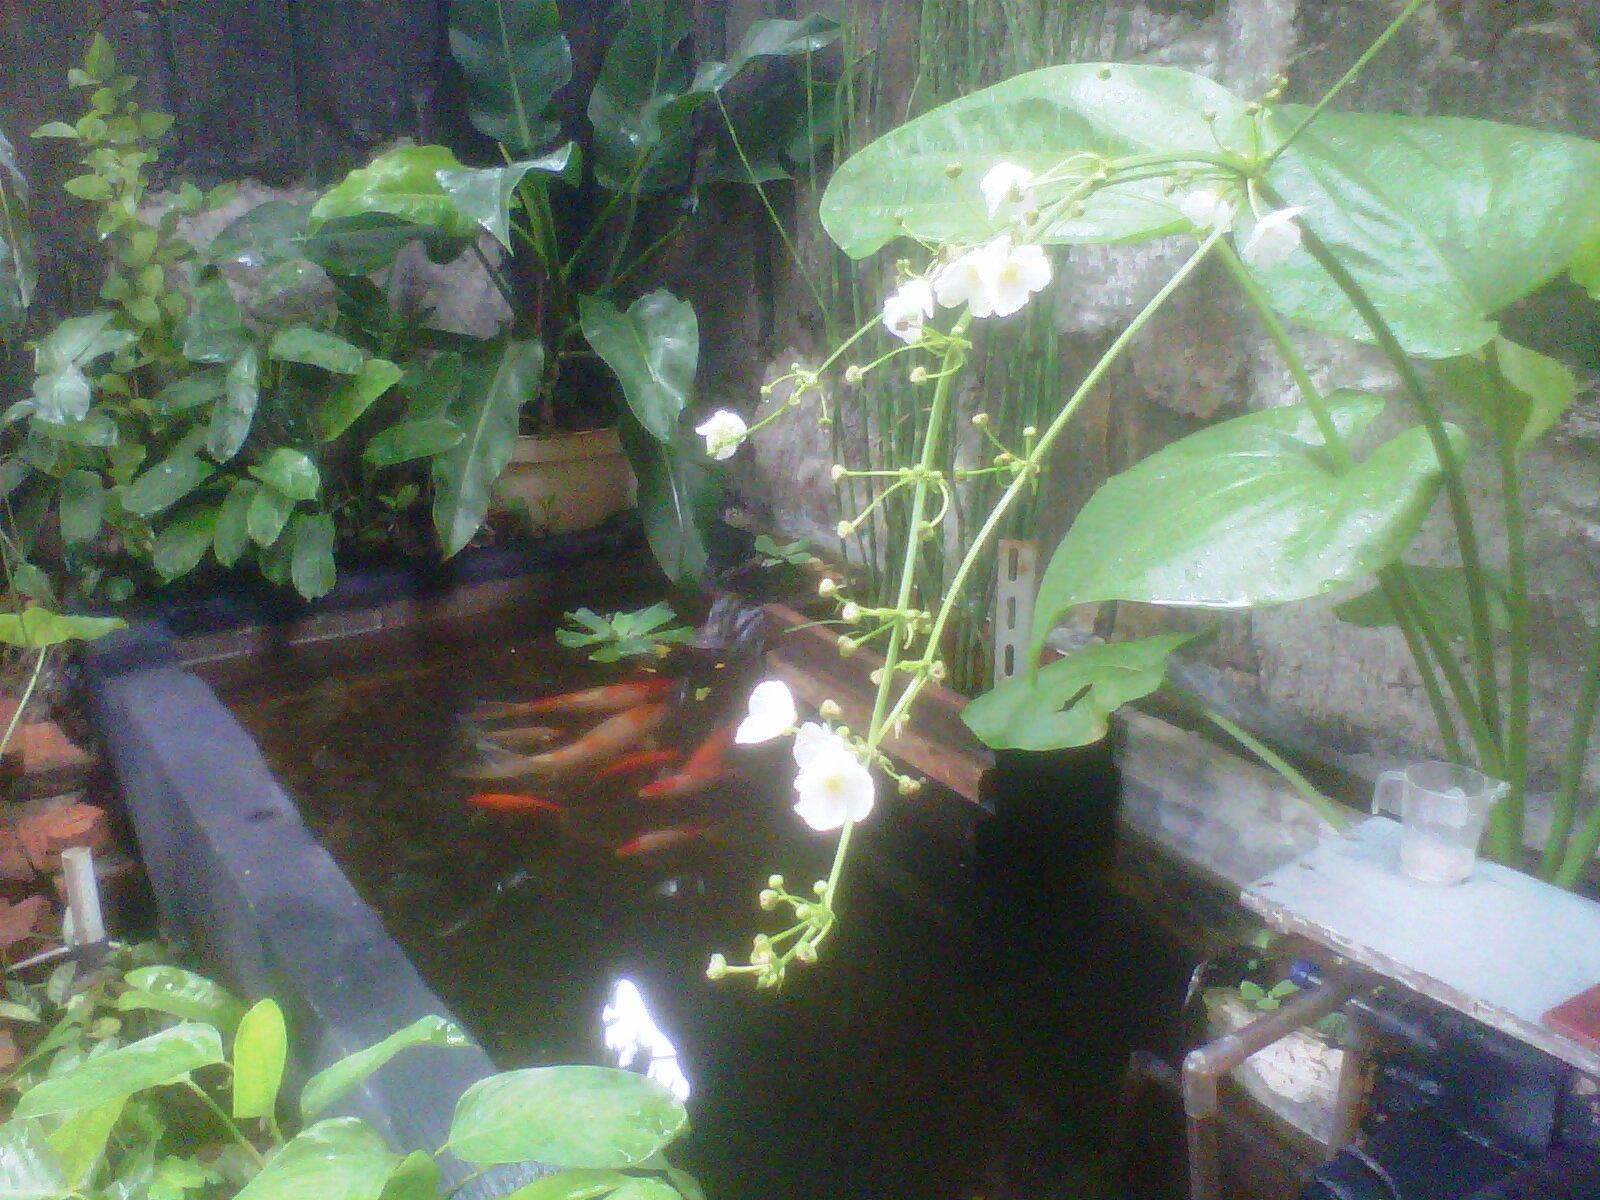 tips membuat kolam ikan minimalis 0821 1222 5020 review